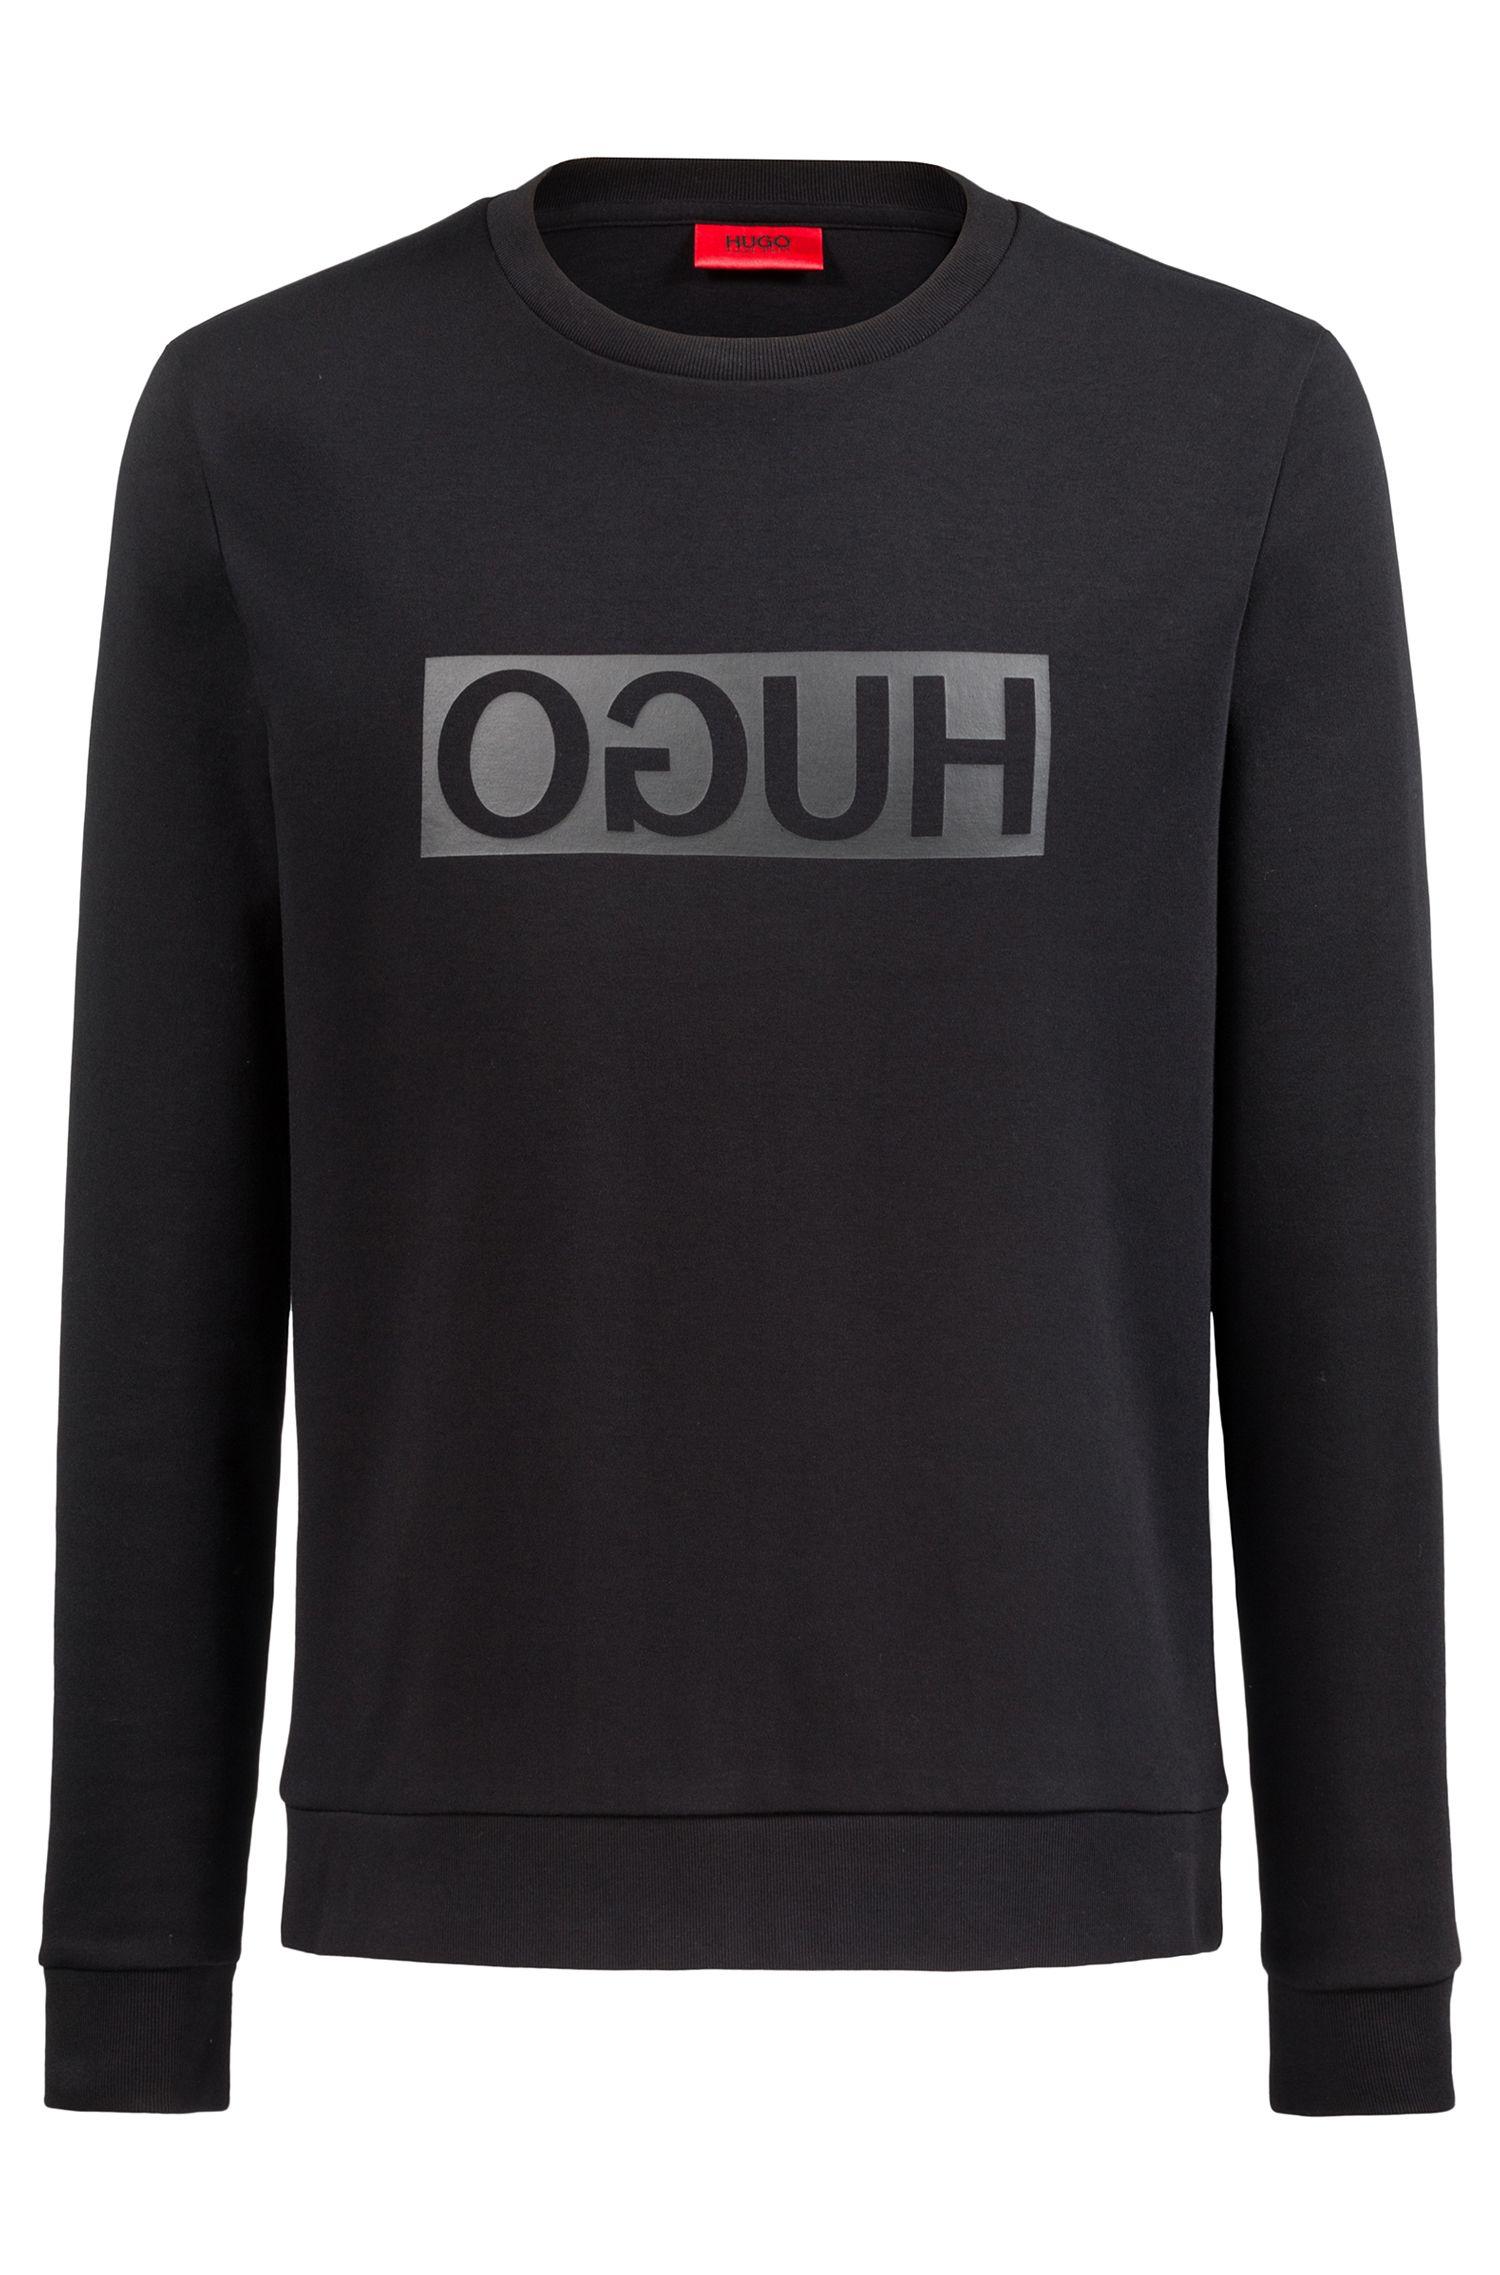 Crew-neck sweatshirt in cotton with reverse-logo print, Black